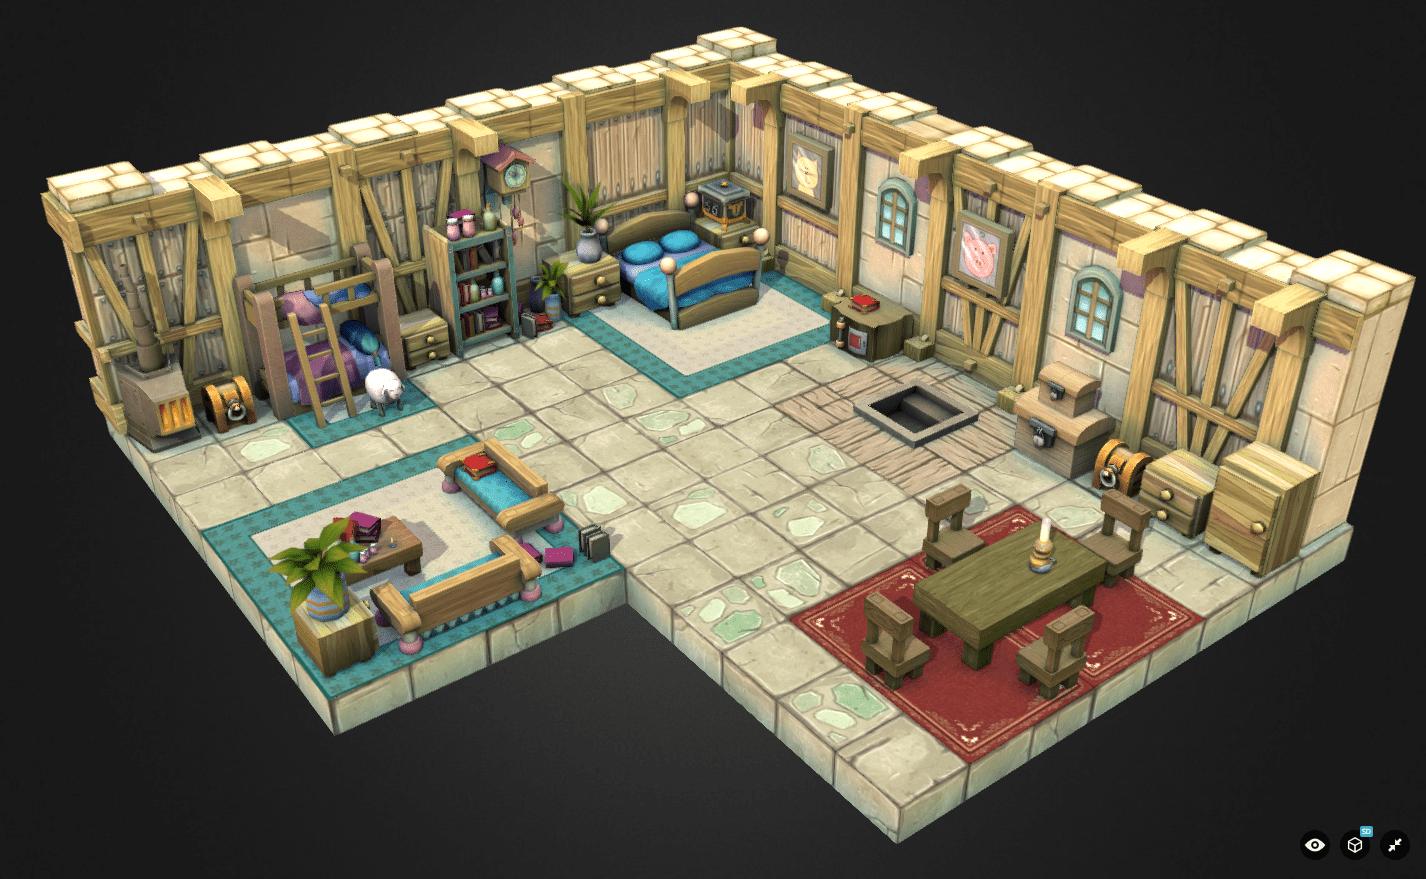 3D Virtual Reality living room